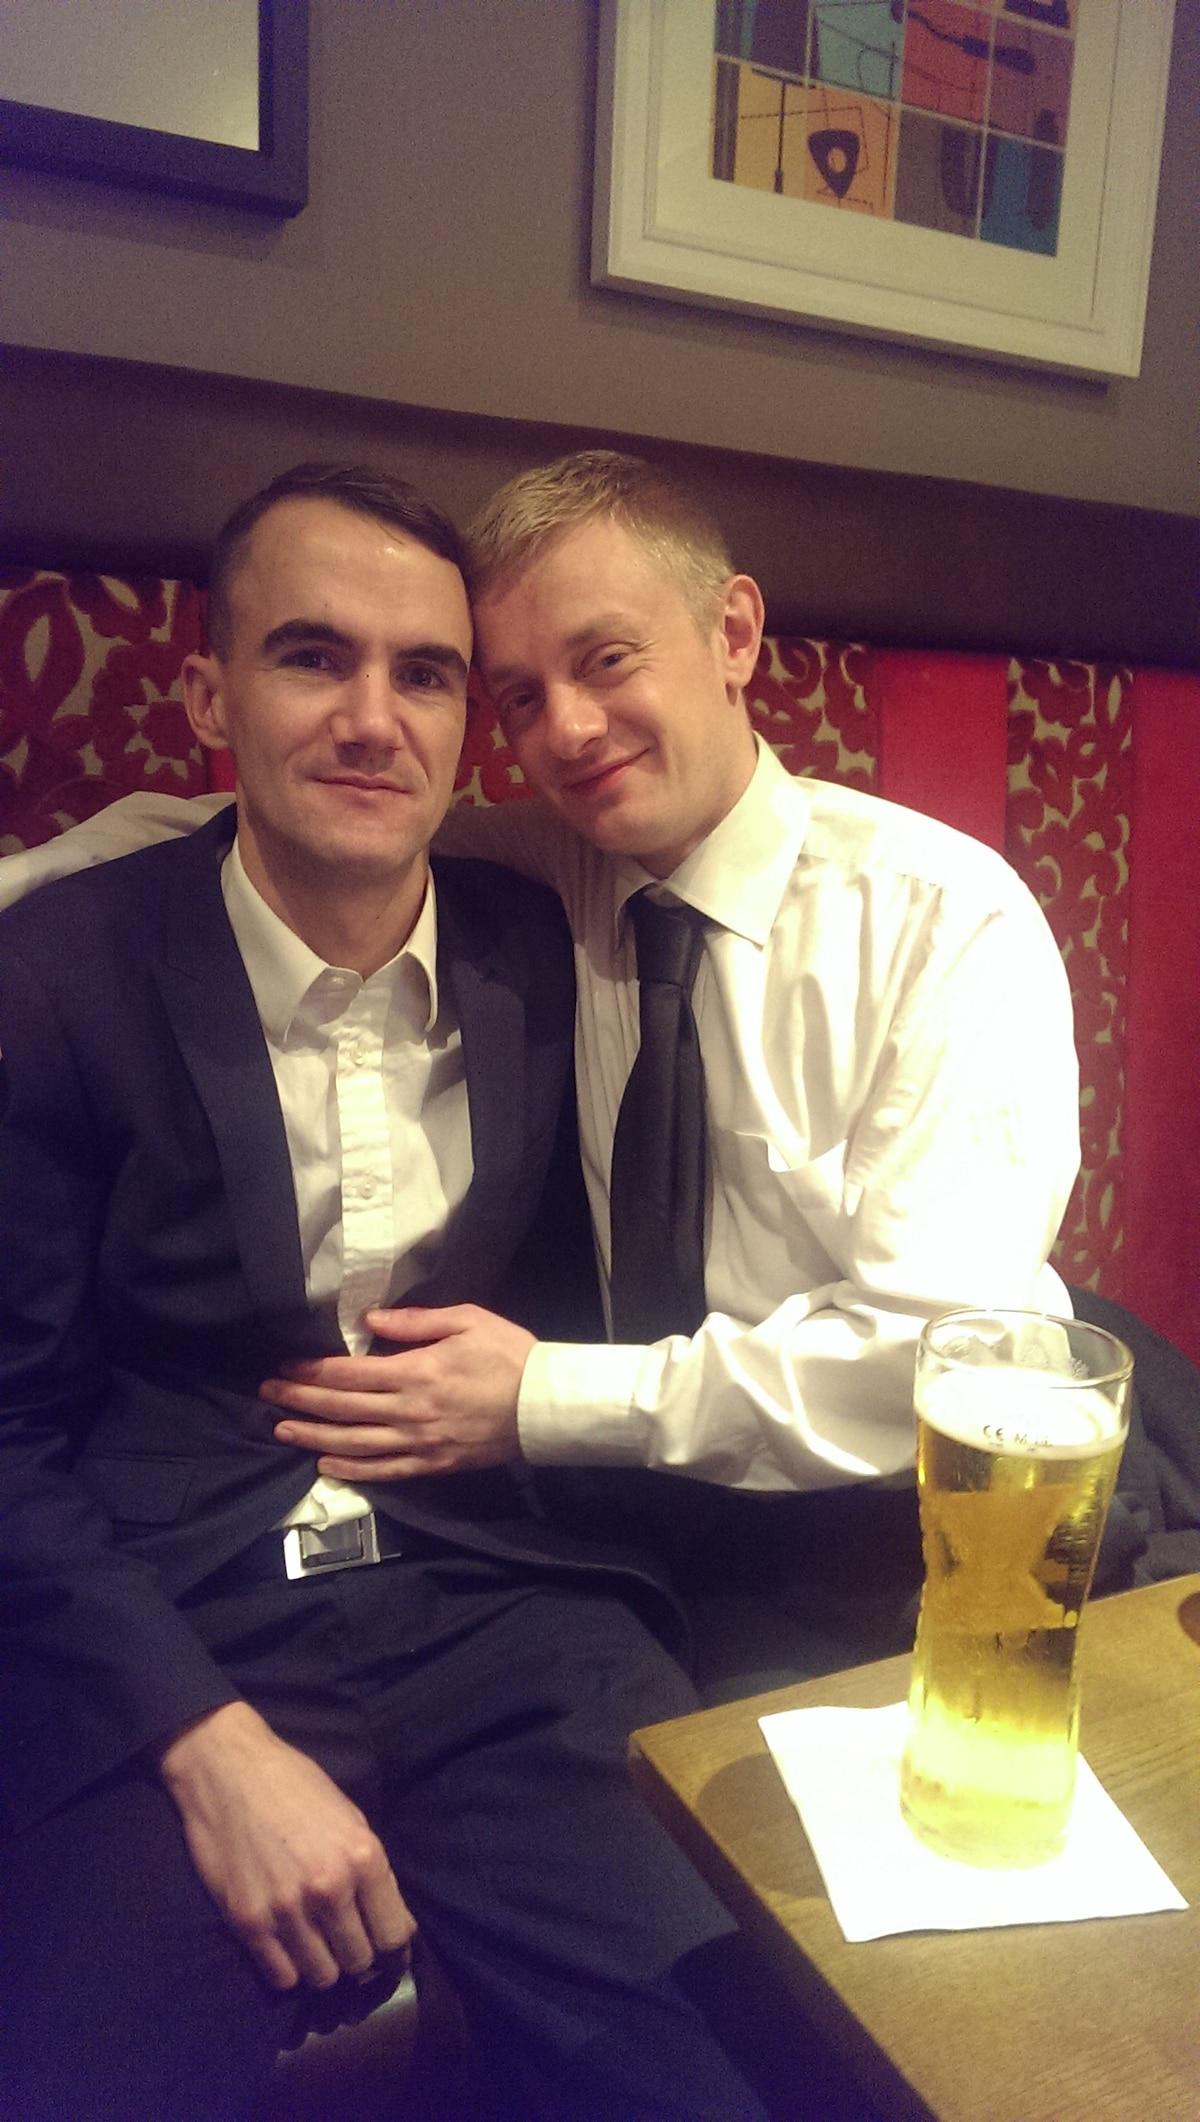 Dan & Garry from Glasgow